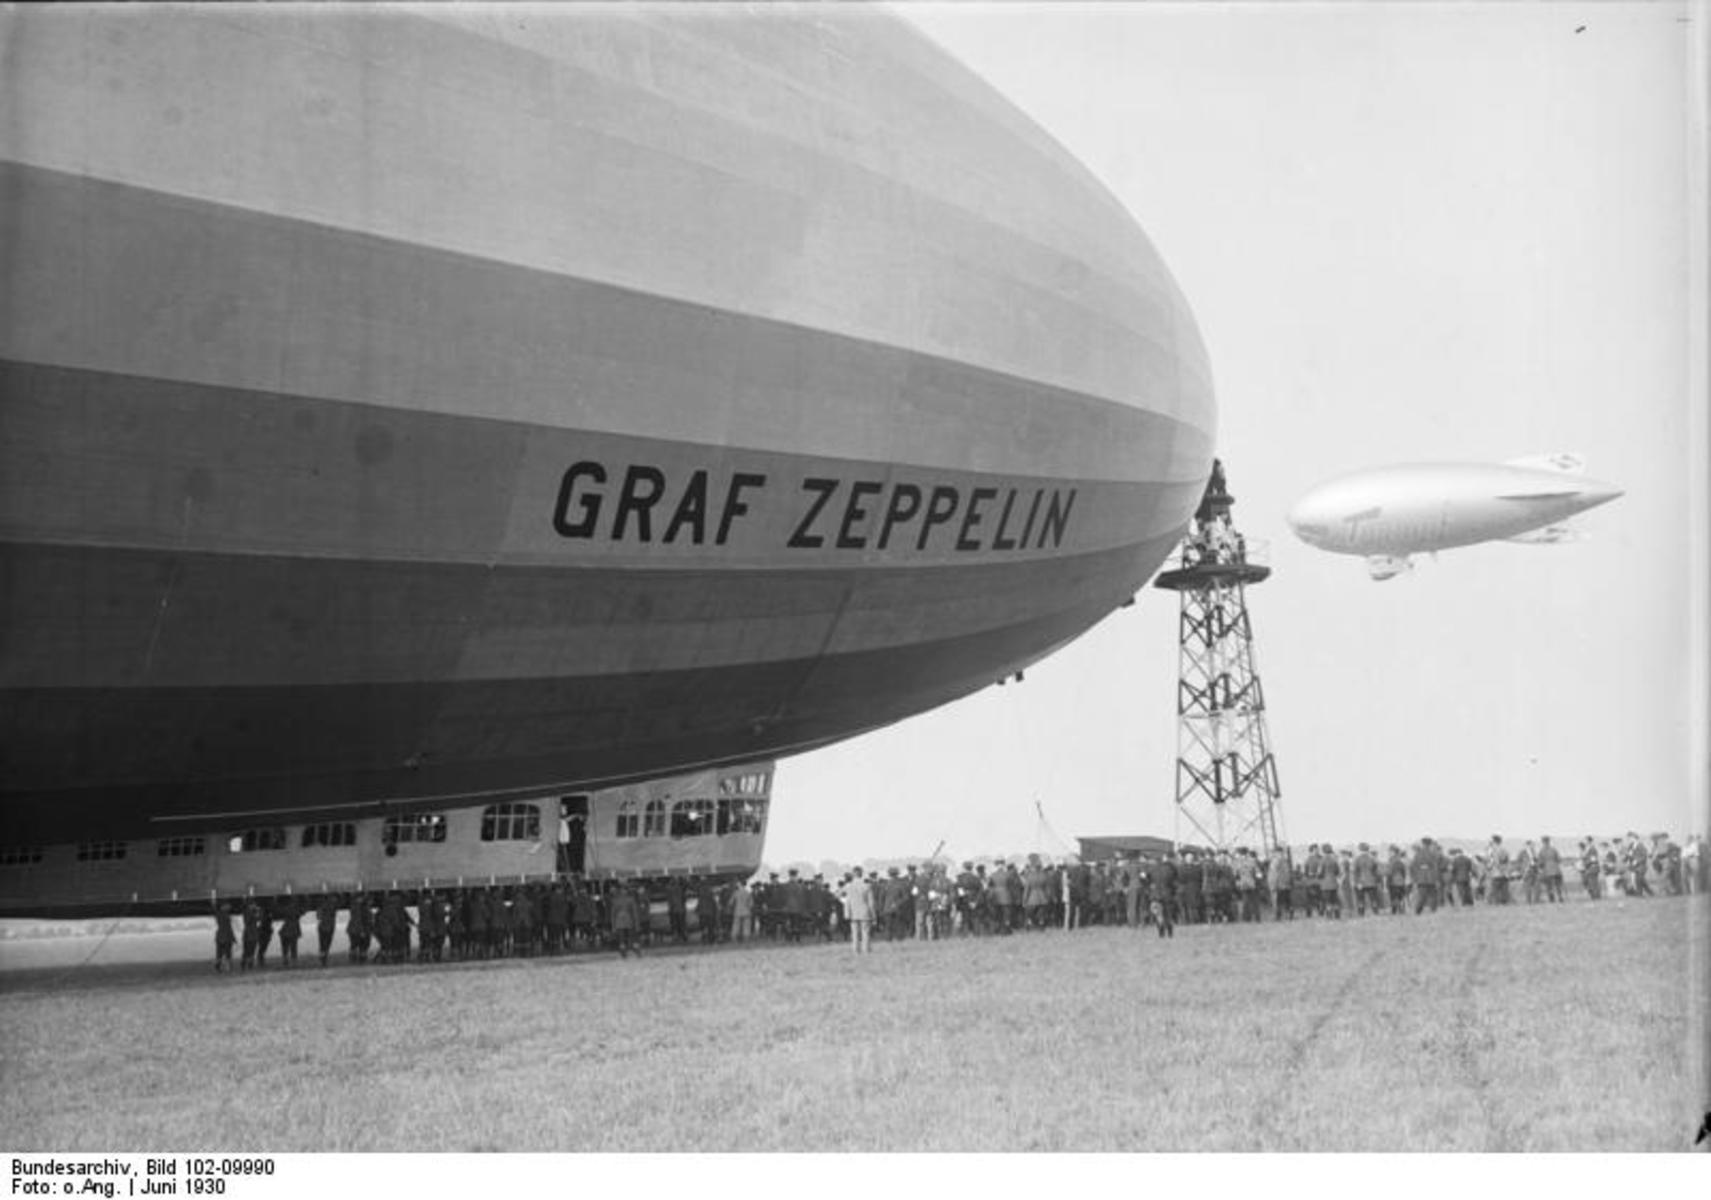 Bundesarchiv_Bild_102-09990,_Berlin-Staaken,_Empfang_des_'Graf_Zeppelin'.jpg